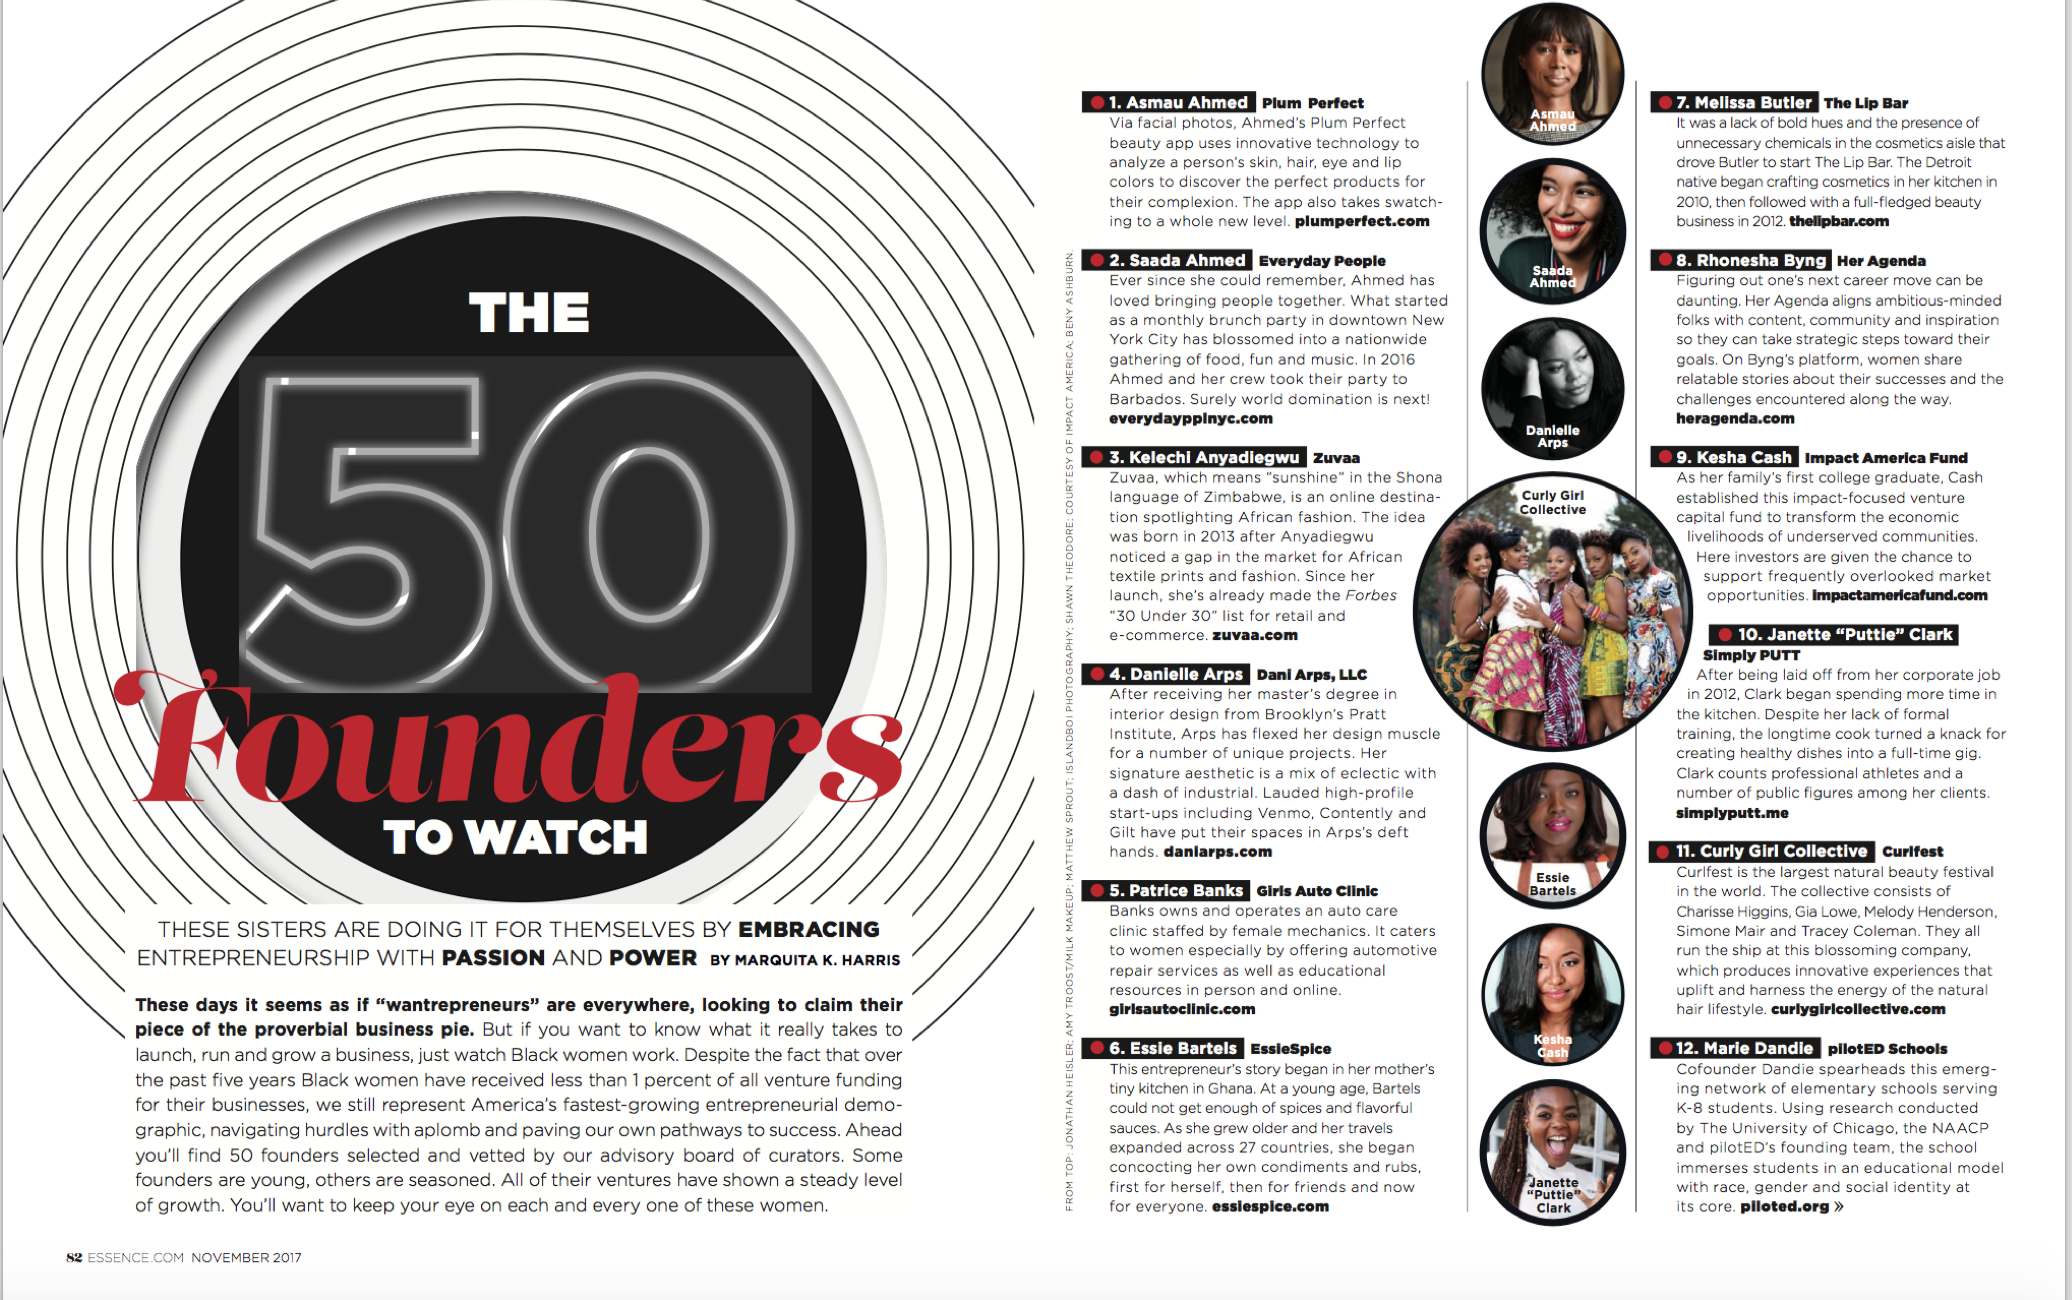 ESSENCE MAGAZINE 50 FOUNDERS TO WATCH - RHONESHA BYNG